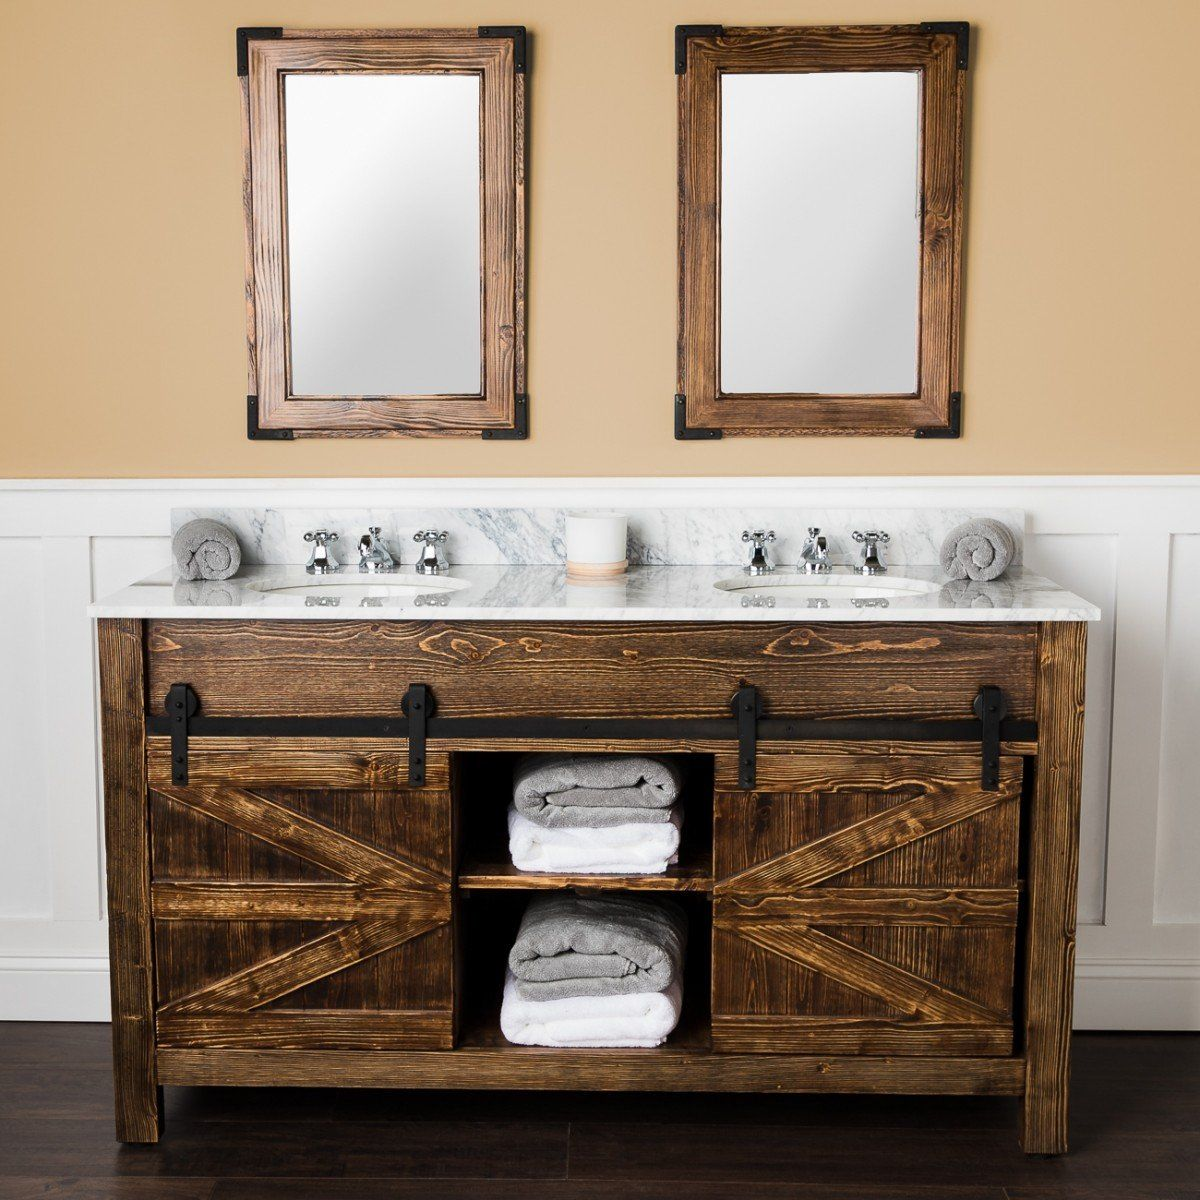 Cottage Barn Door Vanity With Mirror Bathroom Vanity Vanity Ideal Bathrooms